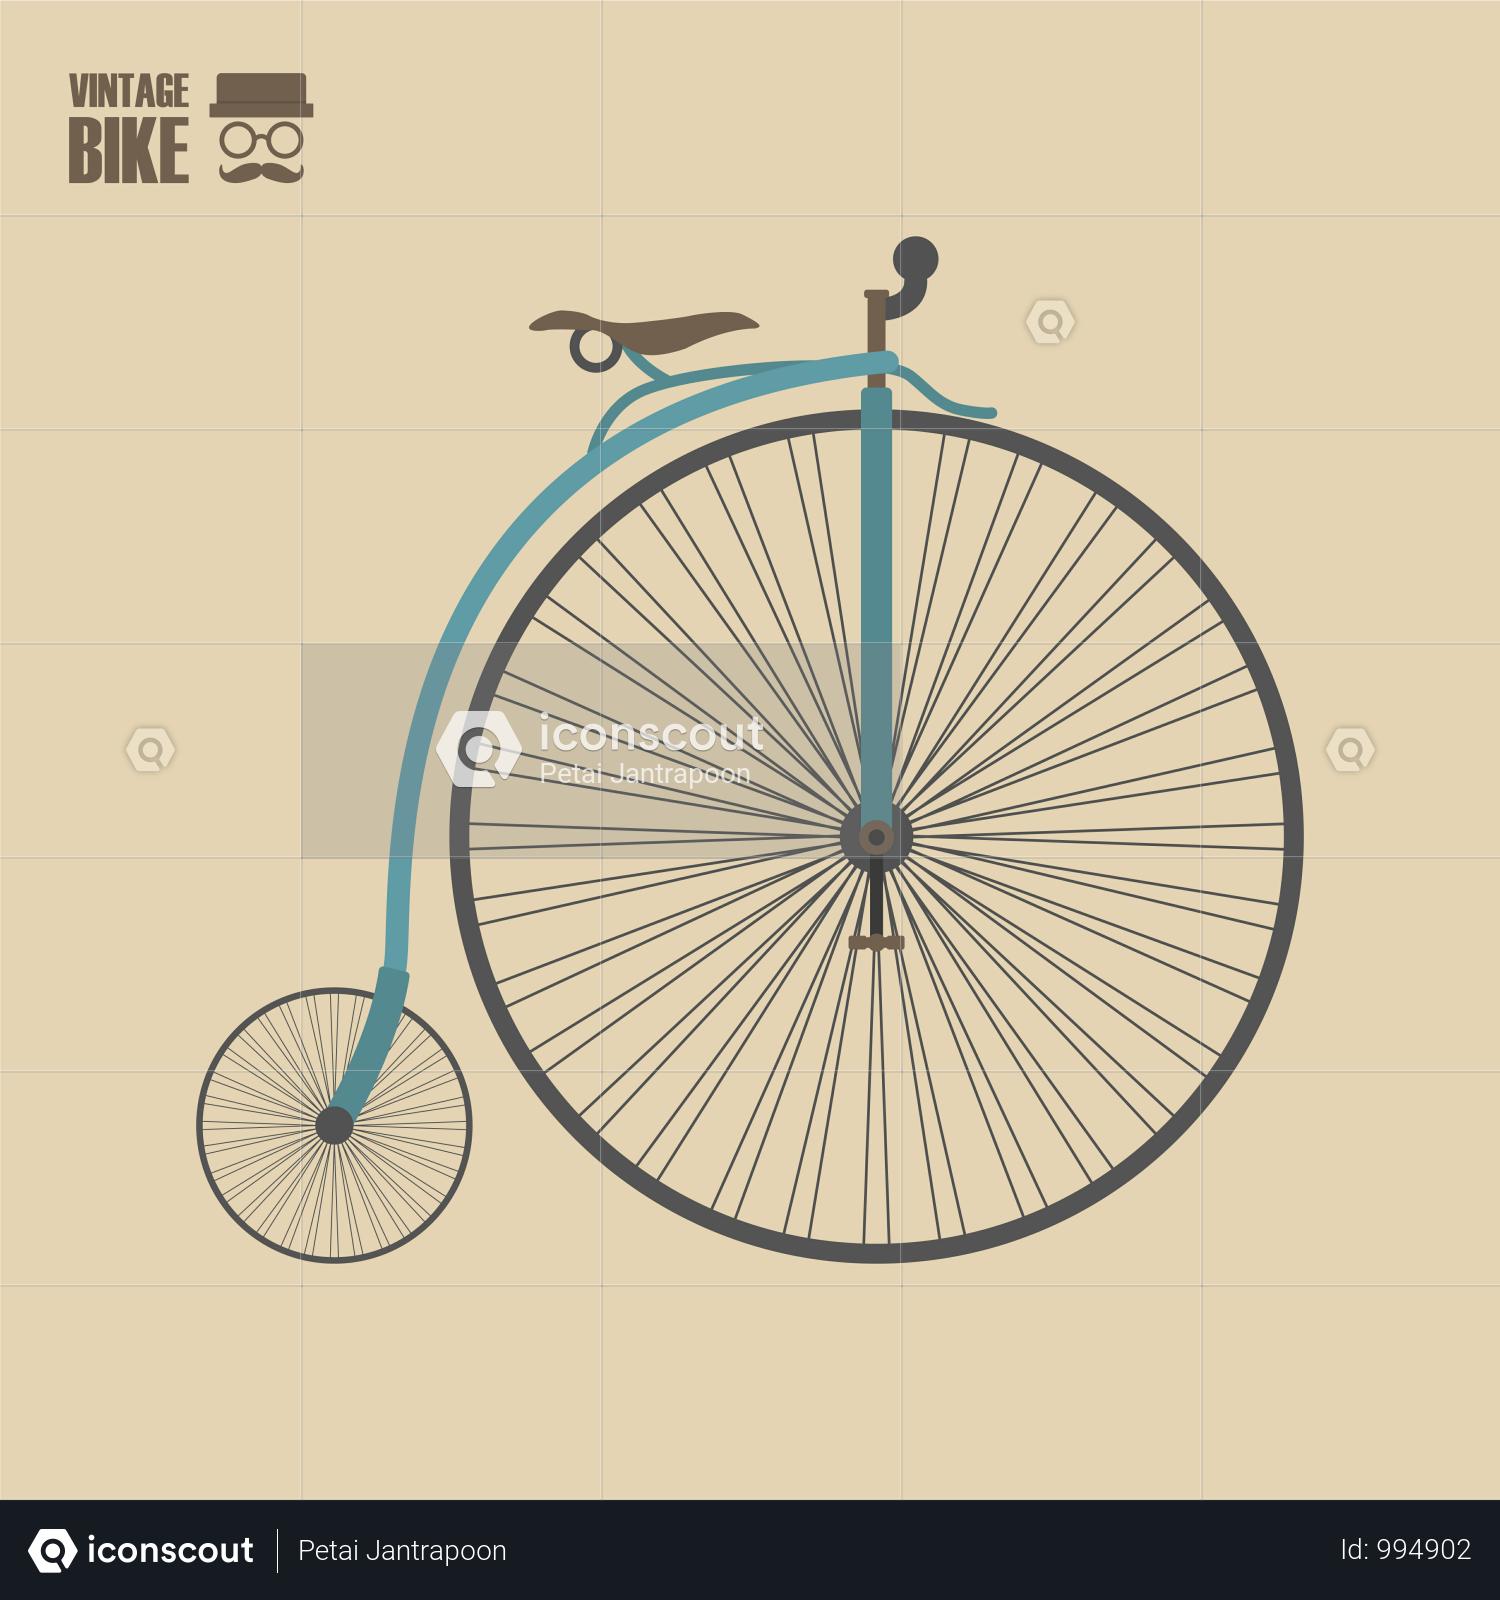 Premium Vintage Bicycle Illustration Download In Png Vector Format Bicycle Illustration Vintage Bicycles Bicycle